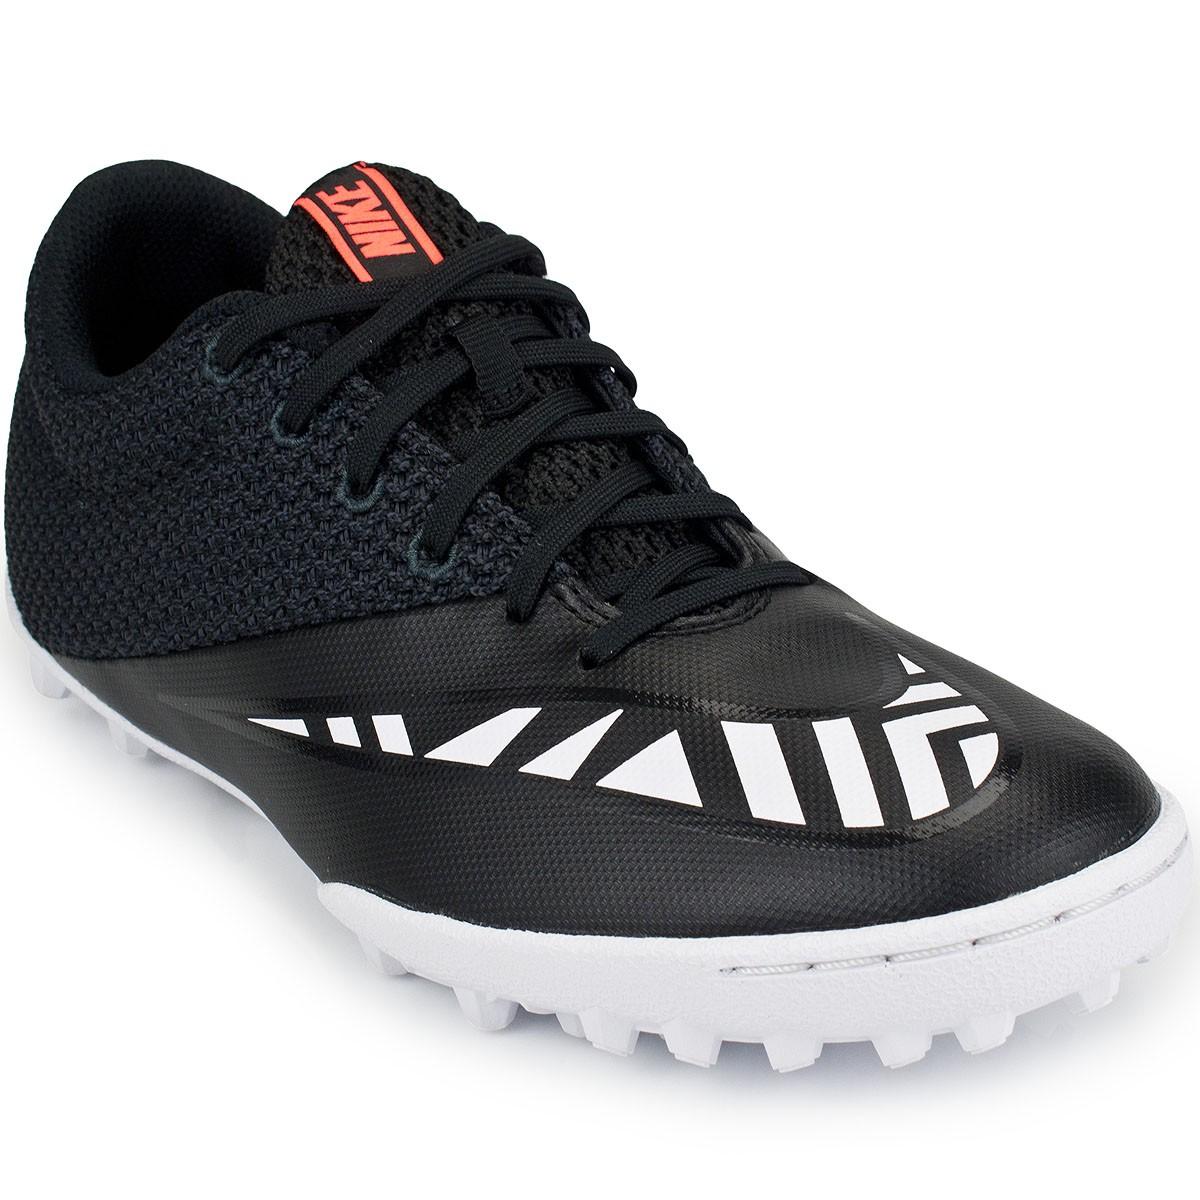 ea0b0bd899 Chuteira Nike Mercurial Pro Street TF 725249